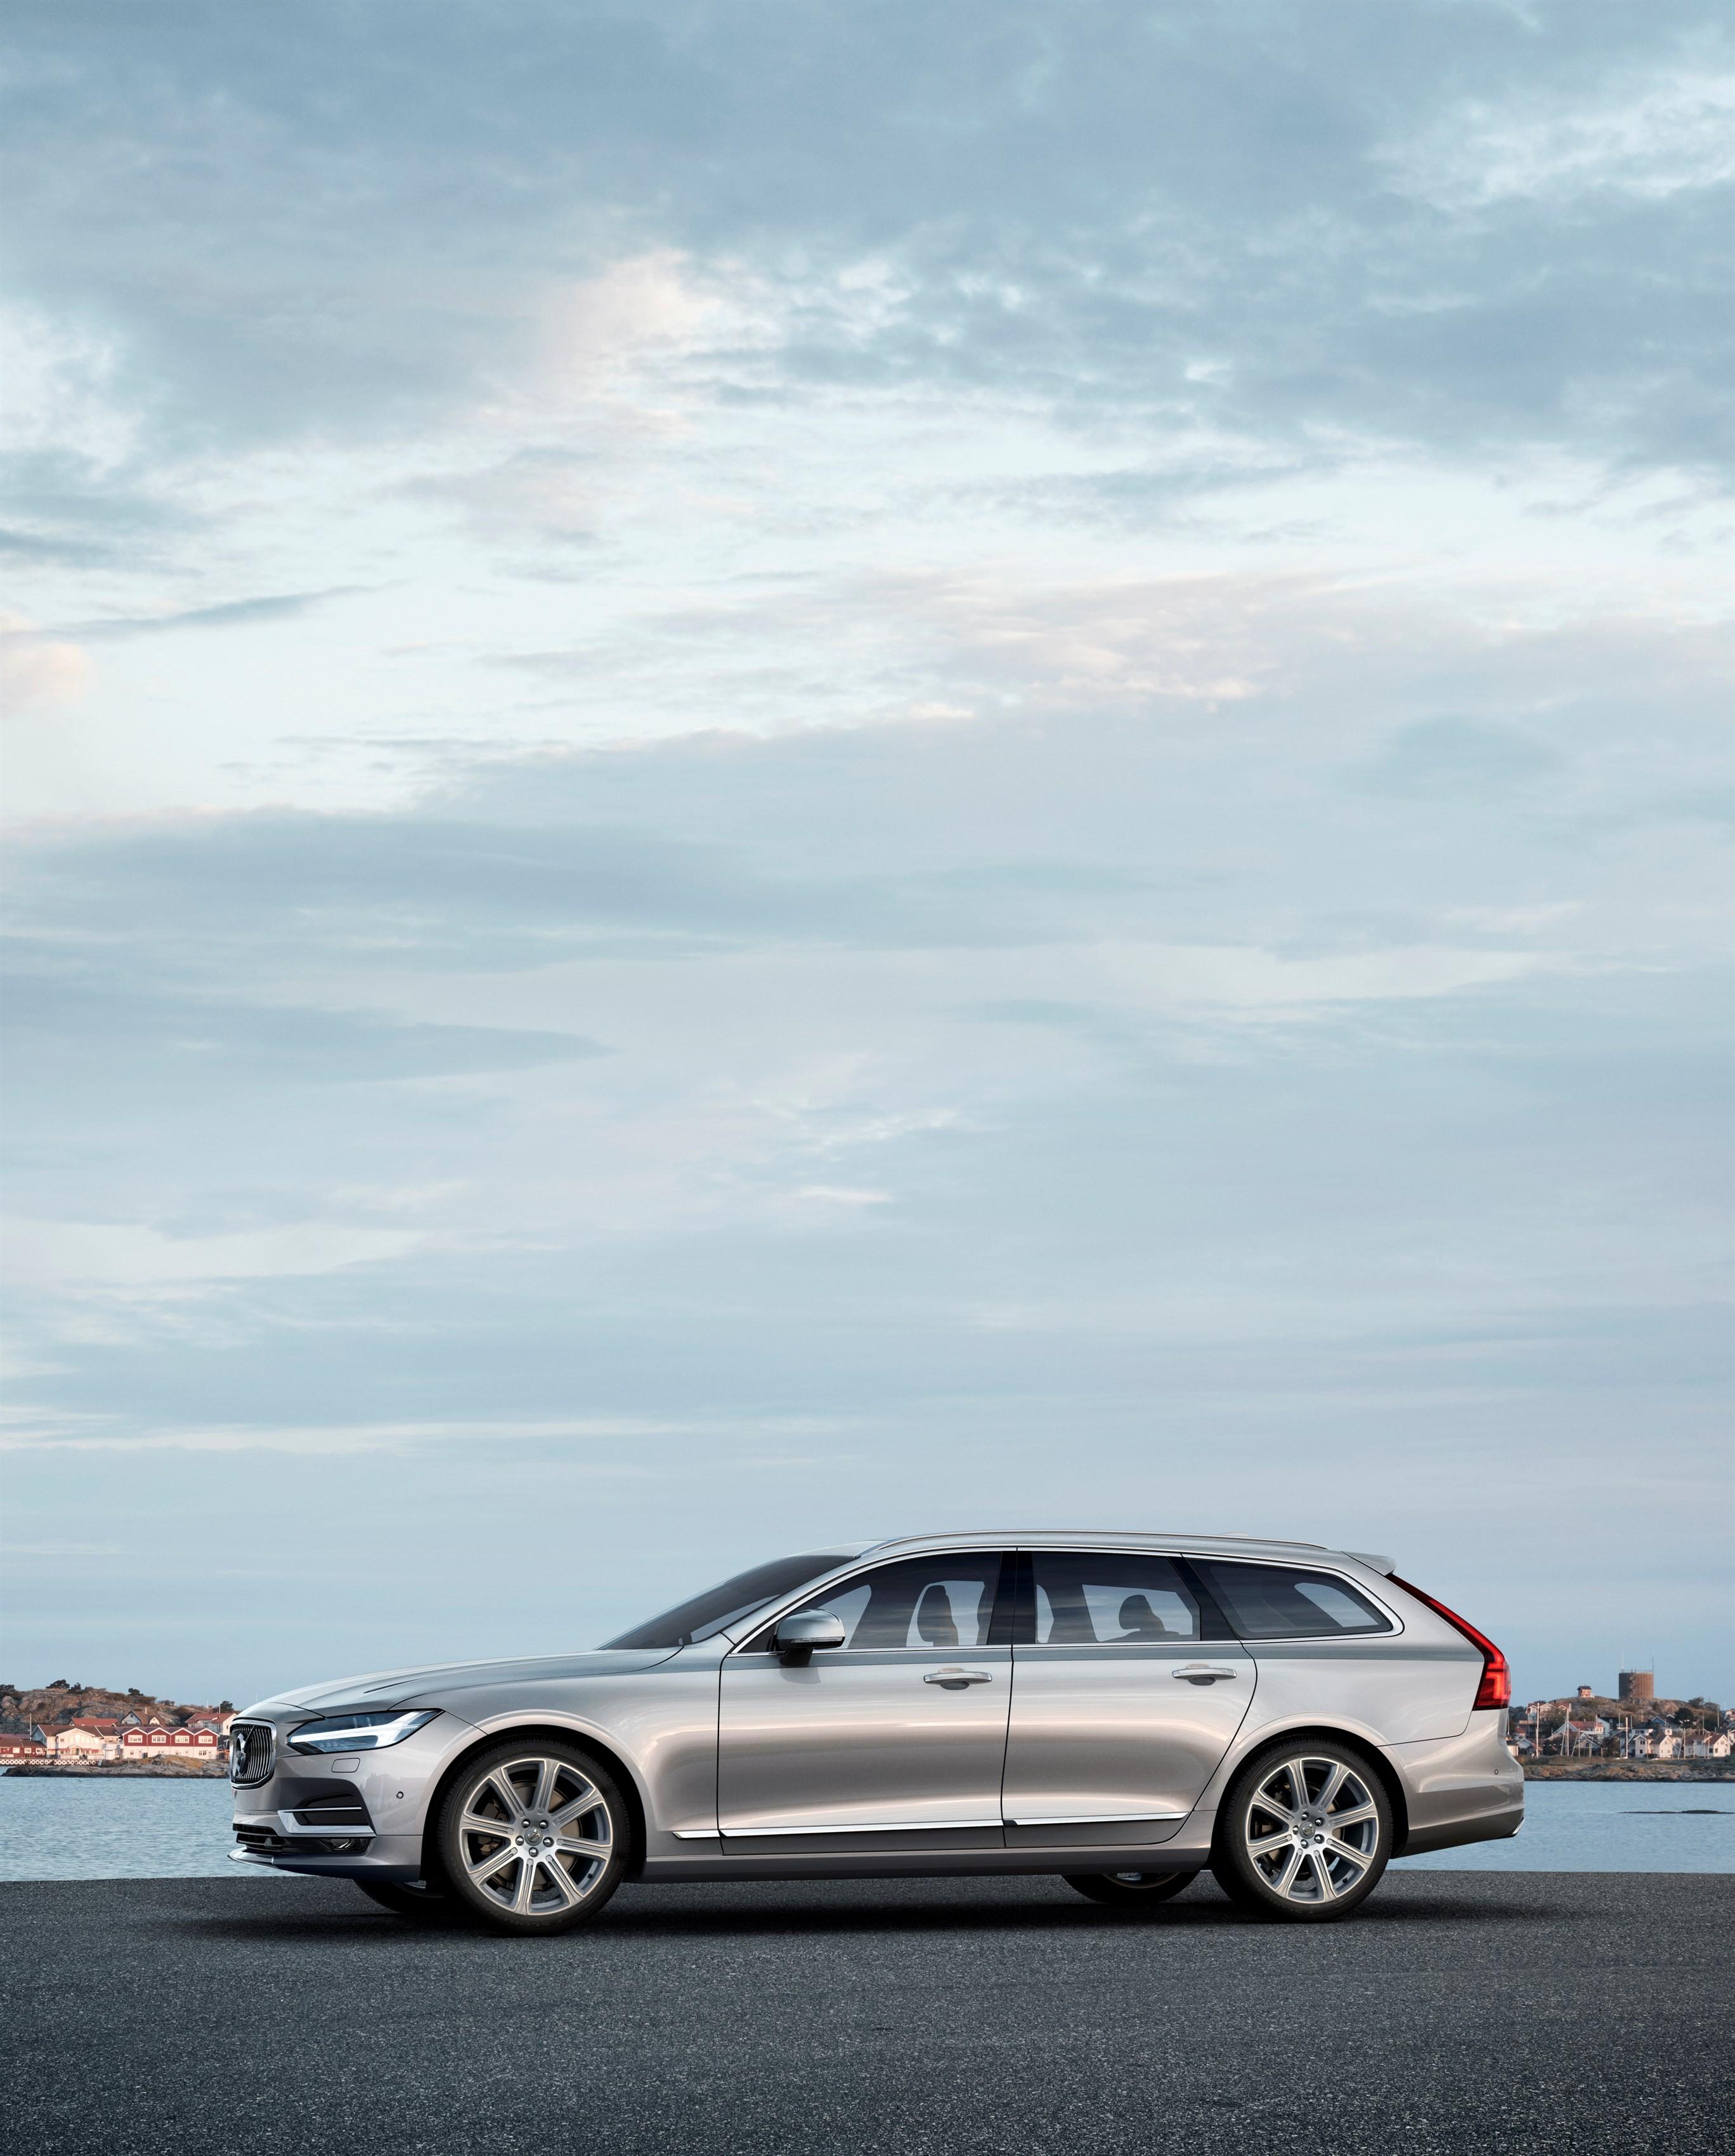 Volvo C90 Price: 2016 Volvo V90 Wagon Officially Revealed In Sweden